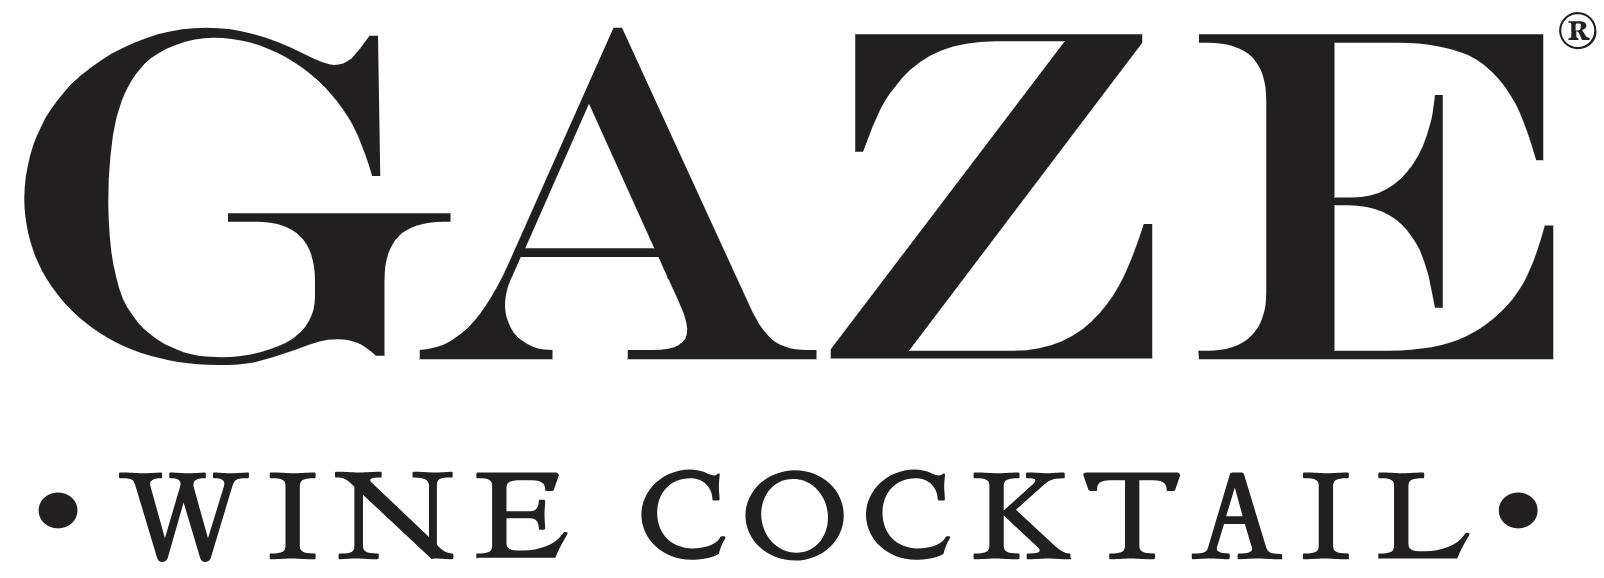 gaze logo